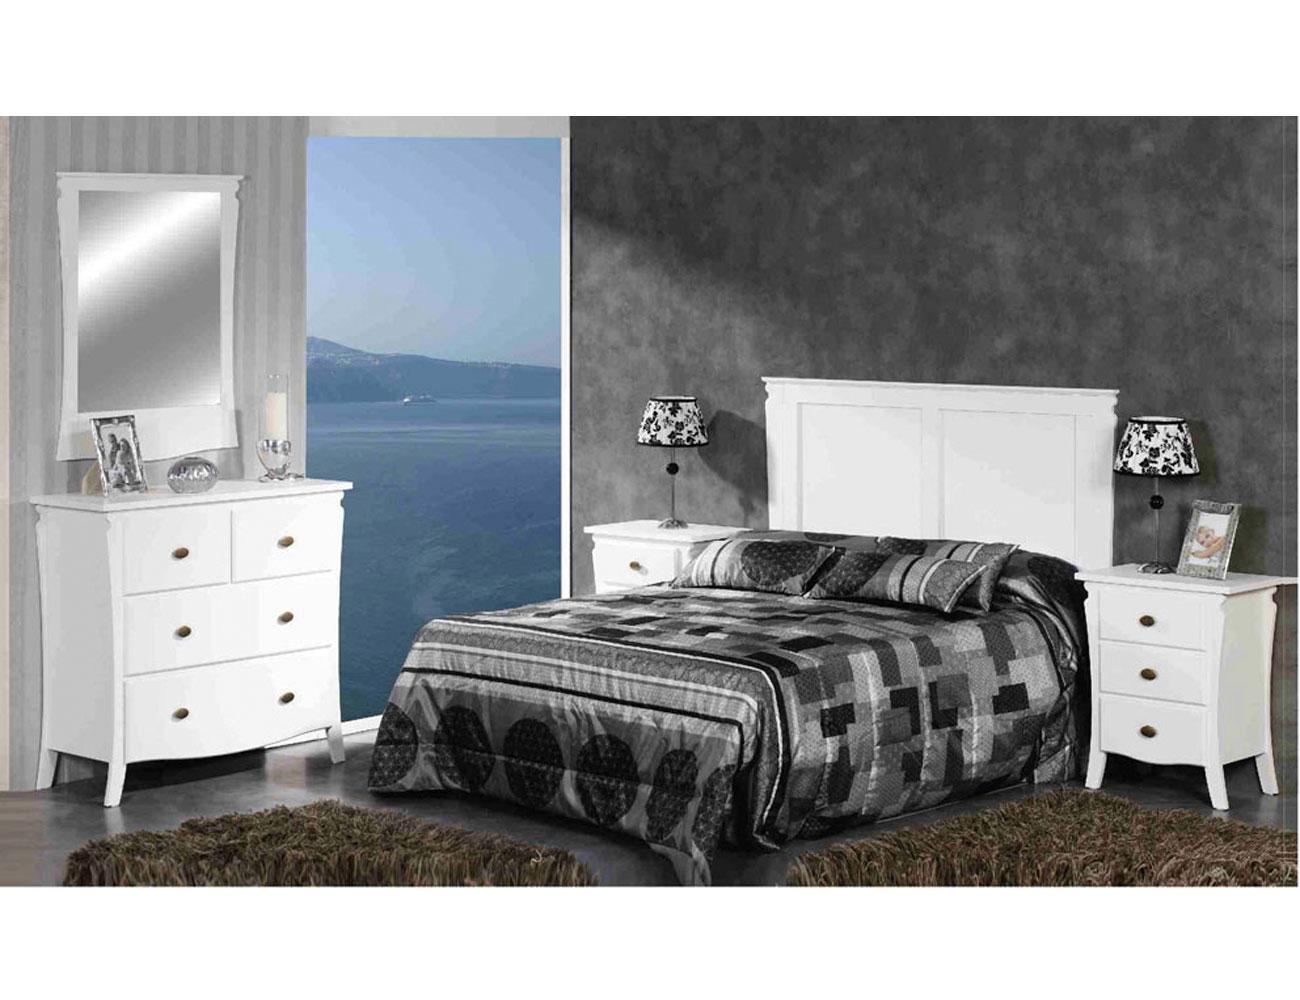 Dormitorio matrimonio blanco lacado madera dm